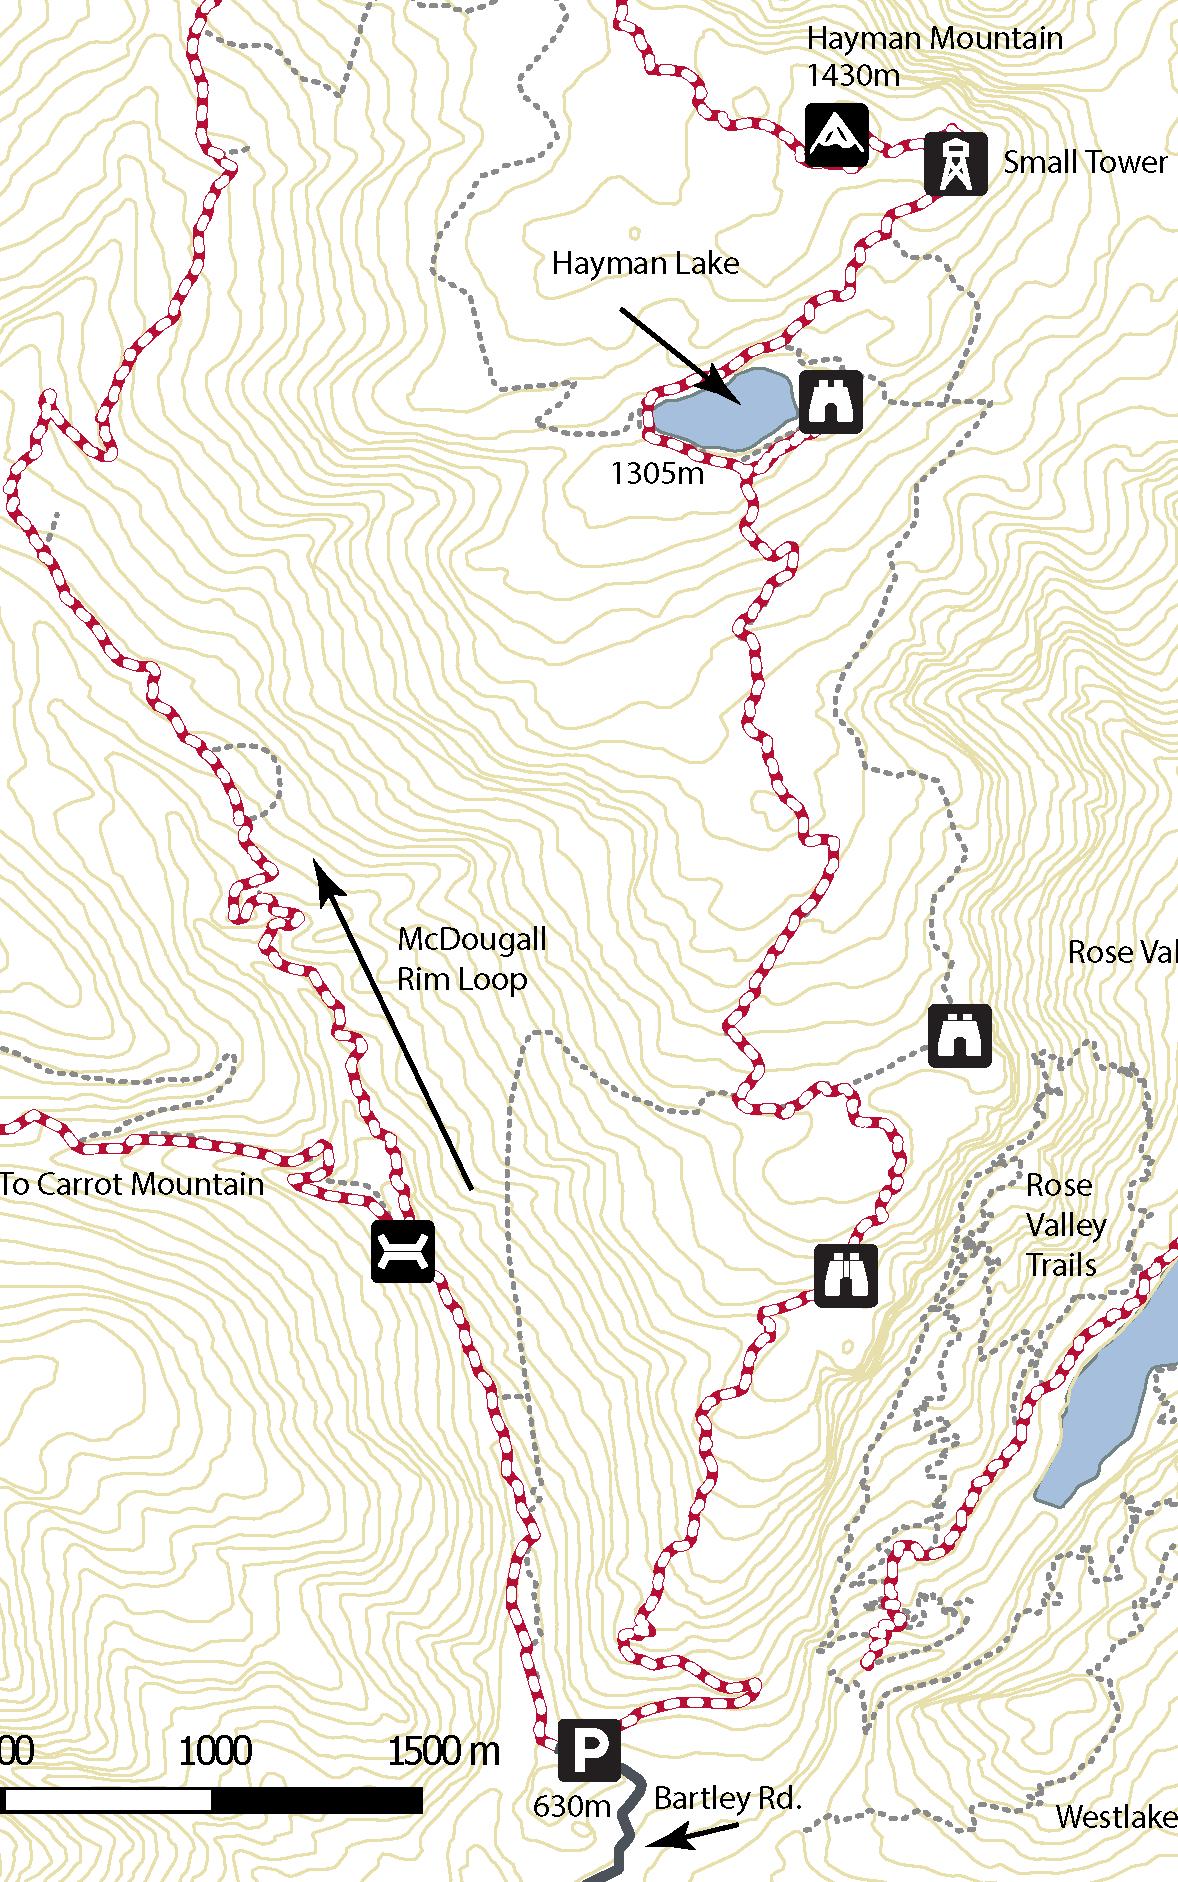 Map of McDougal Rim trail and Hayman Lake/Summit